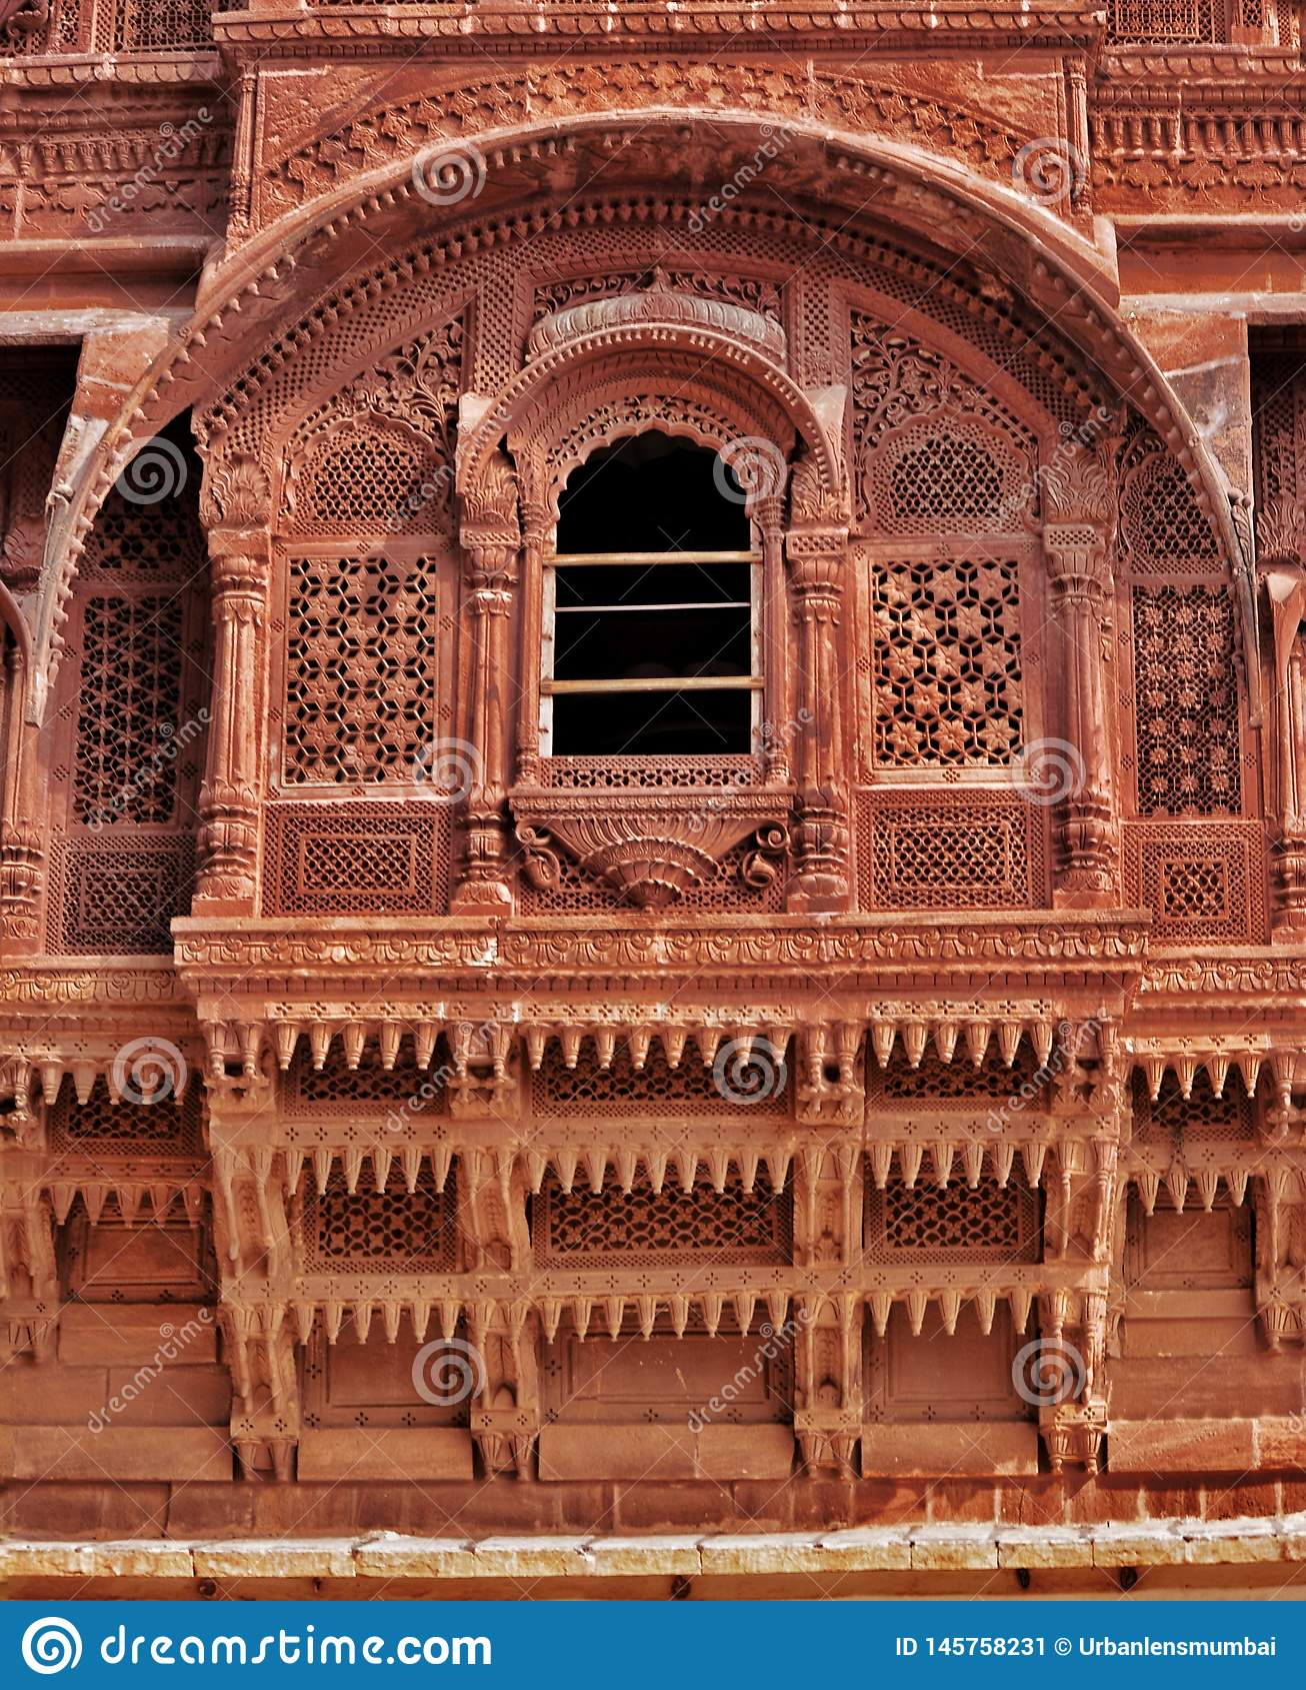 Piękno Indiański dziedzictwa miasta pałac, Jaipur